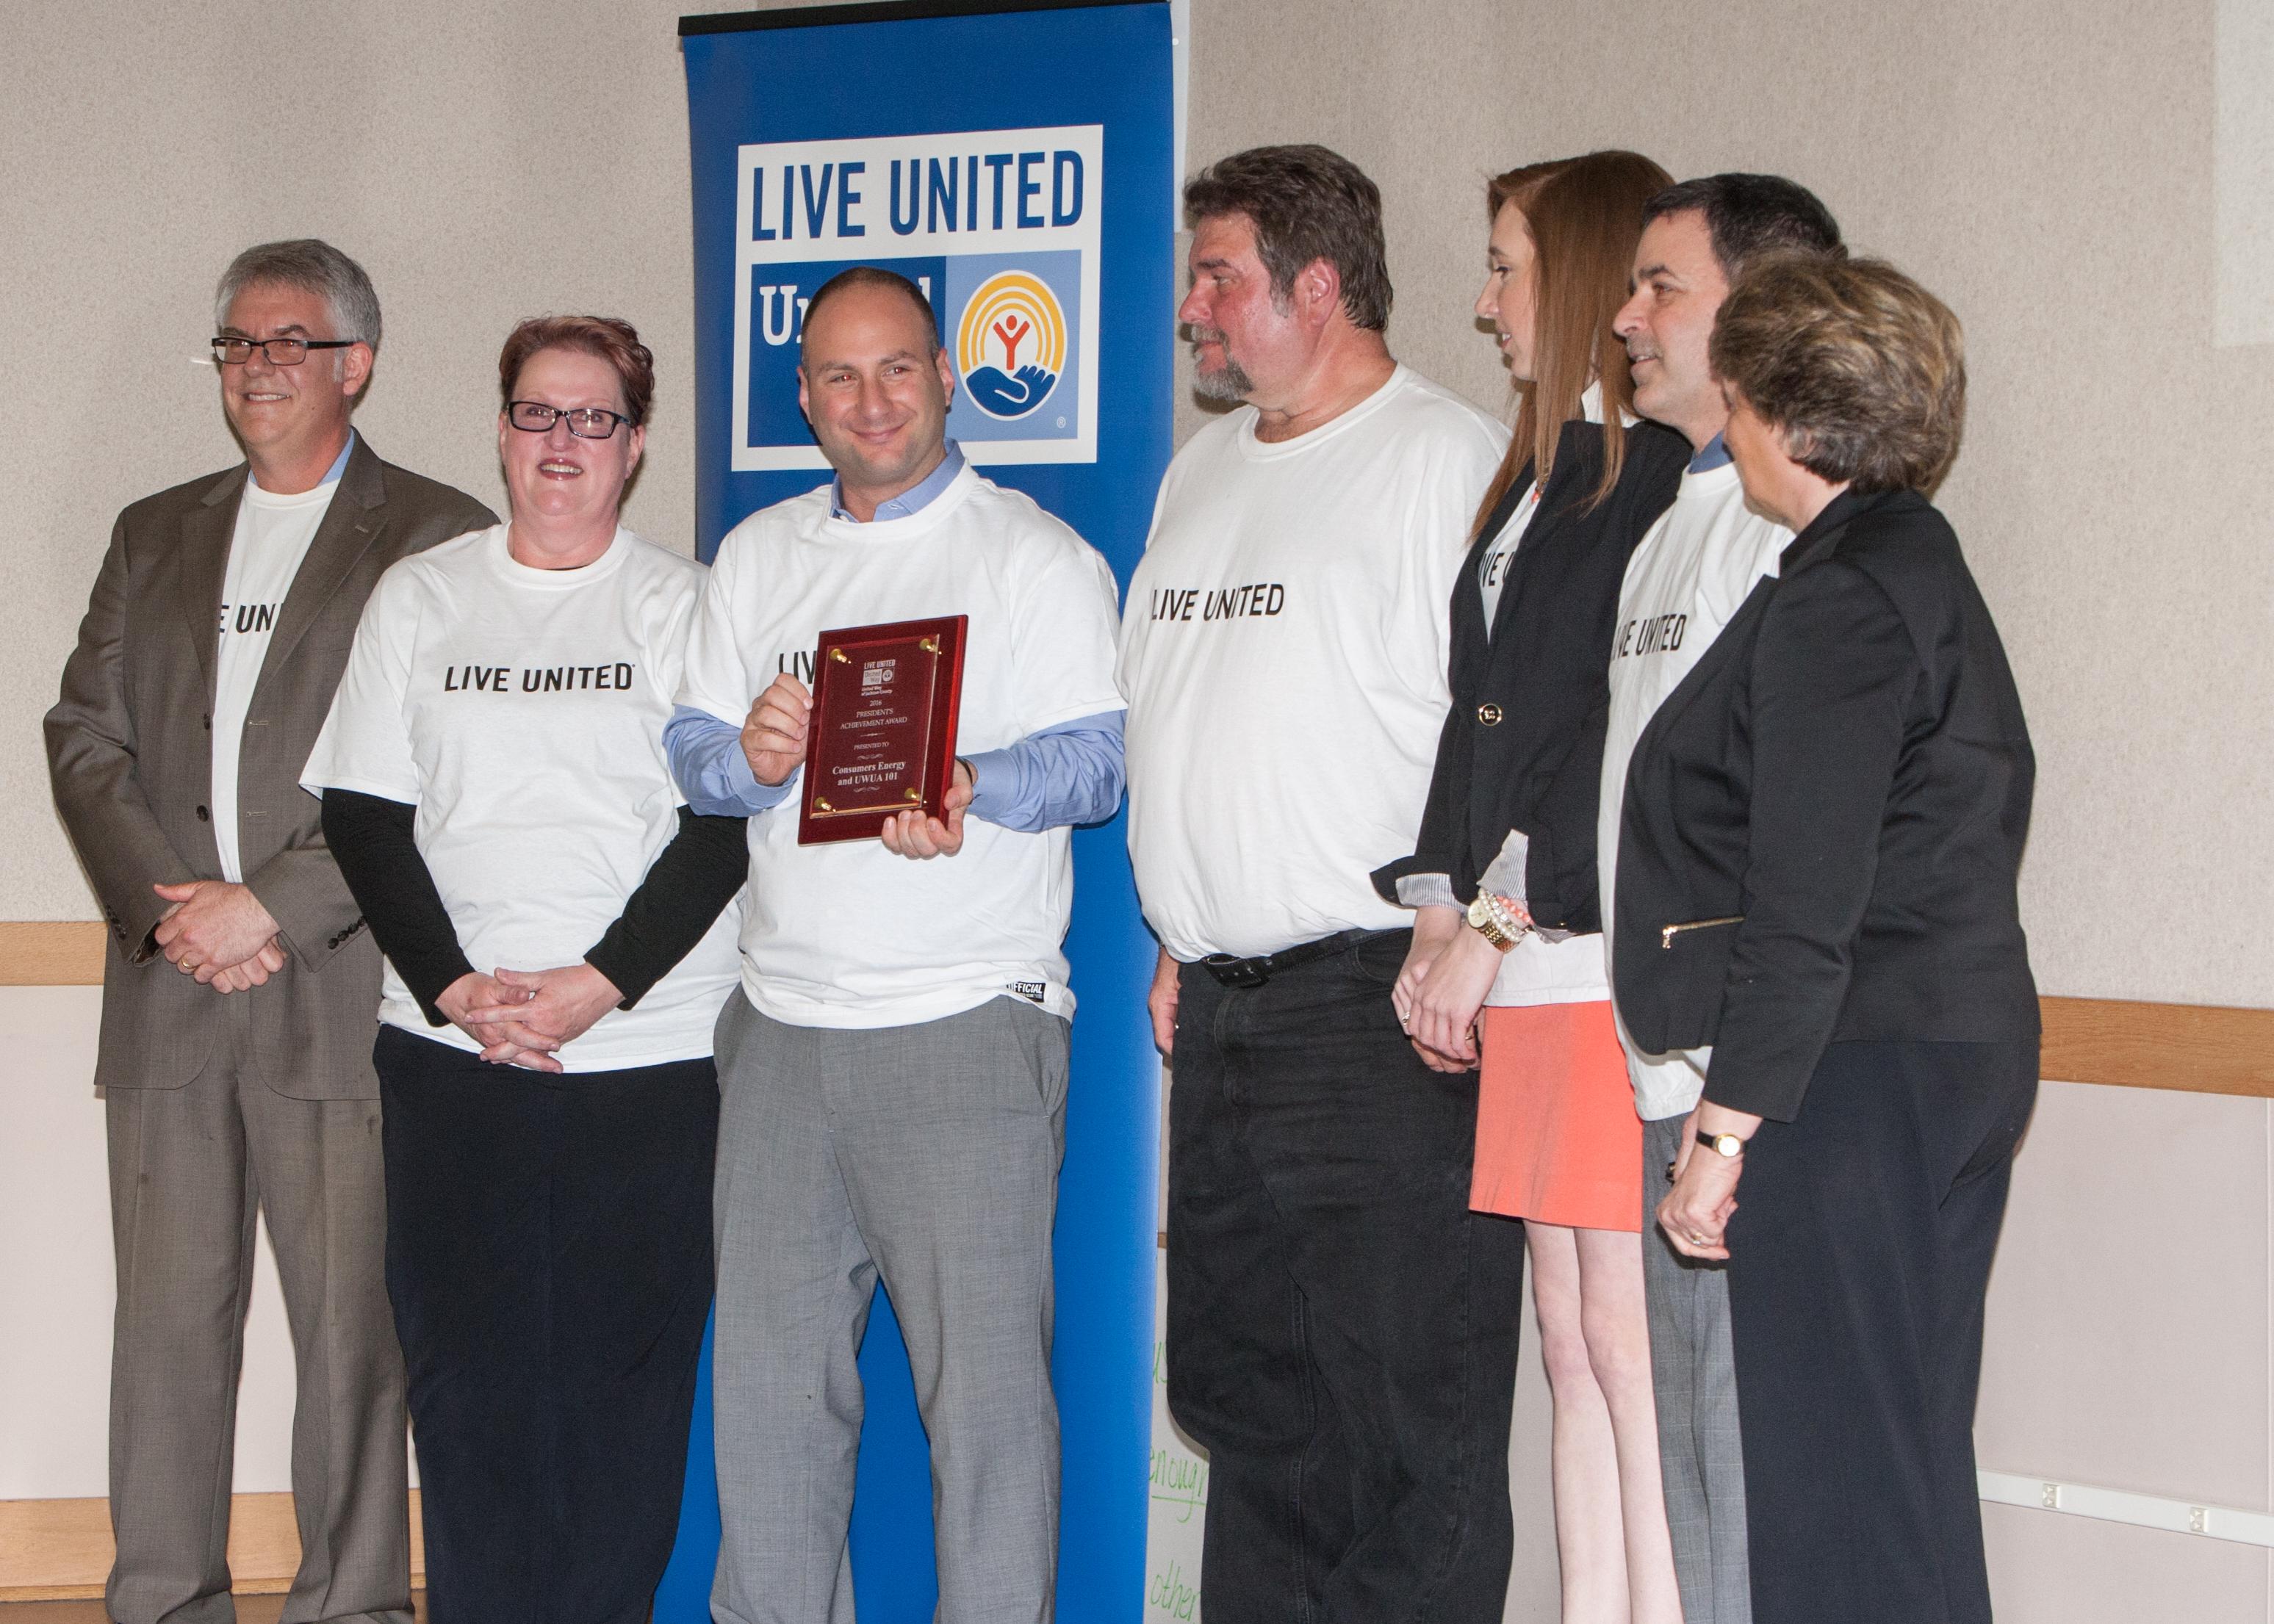 President's Achievement Award Recipient - Consumers Energy